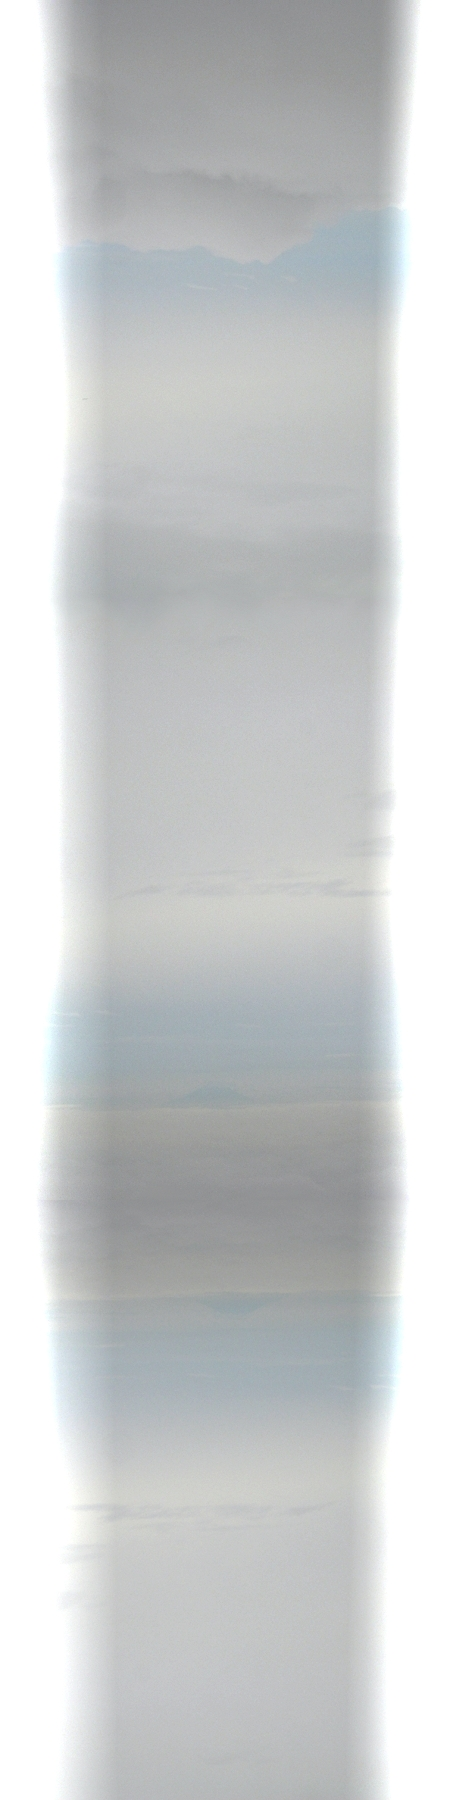 cloudbreath450455vv.JPG